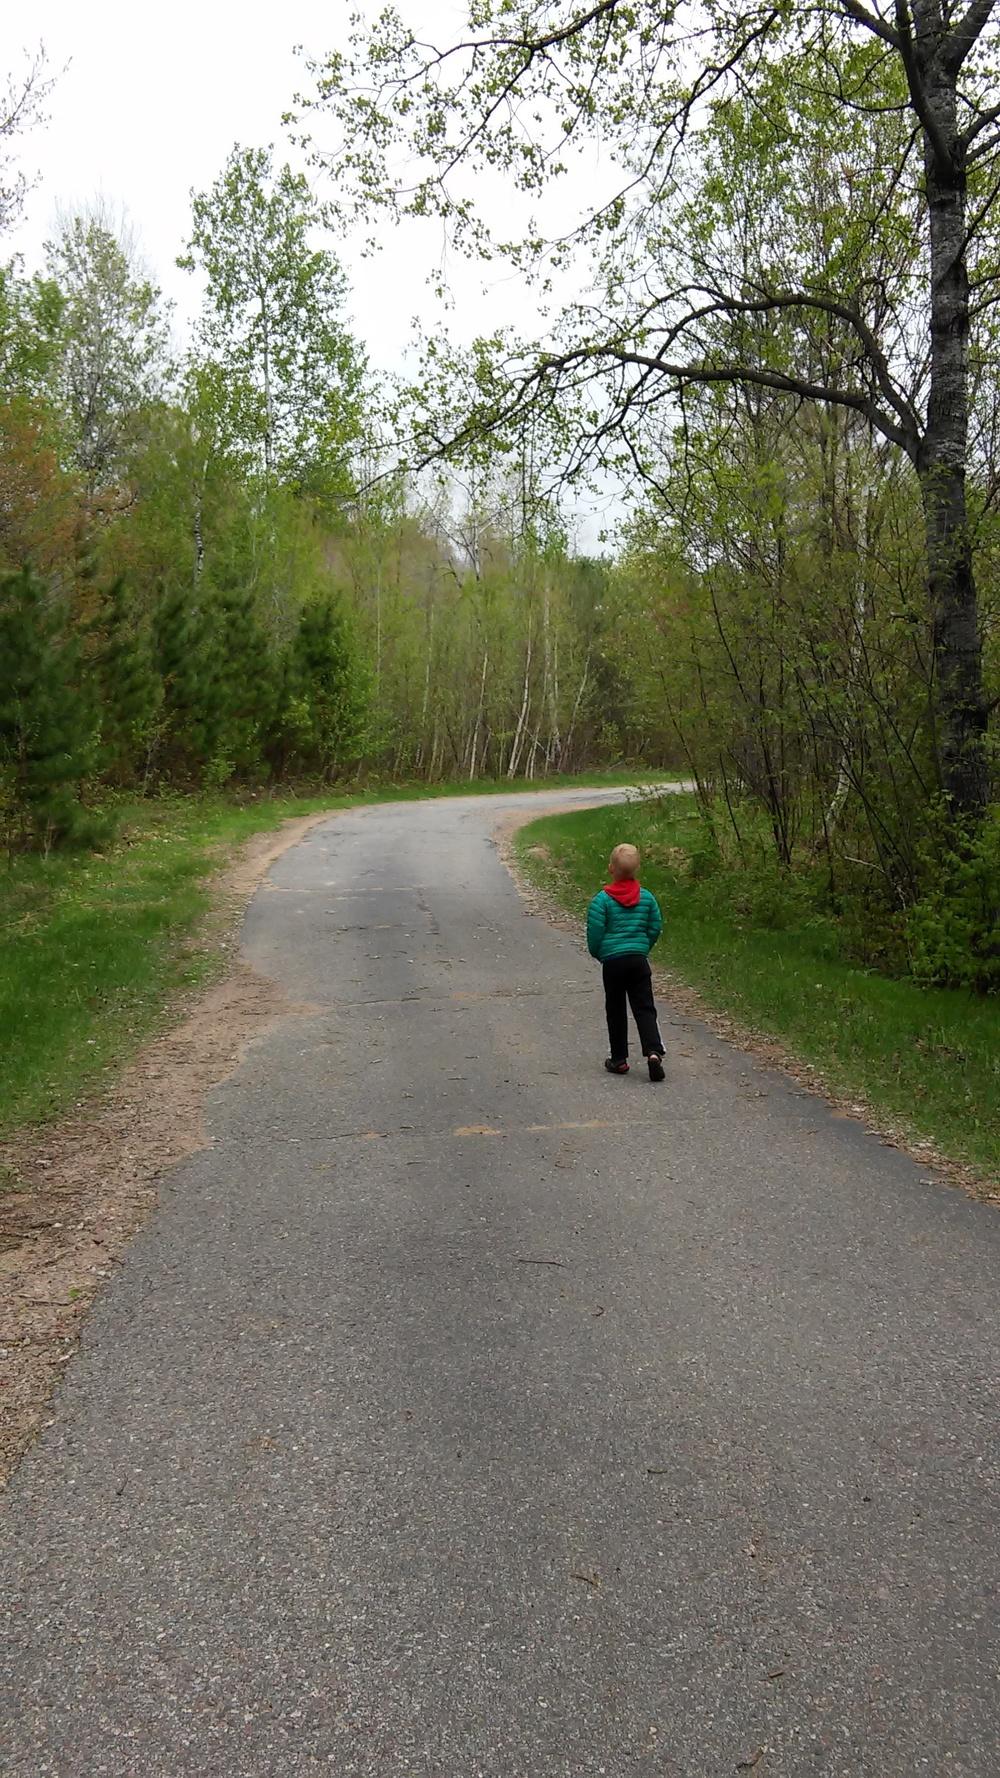 Ewan casin' the driveway